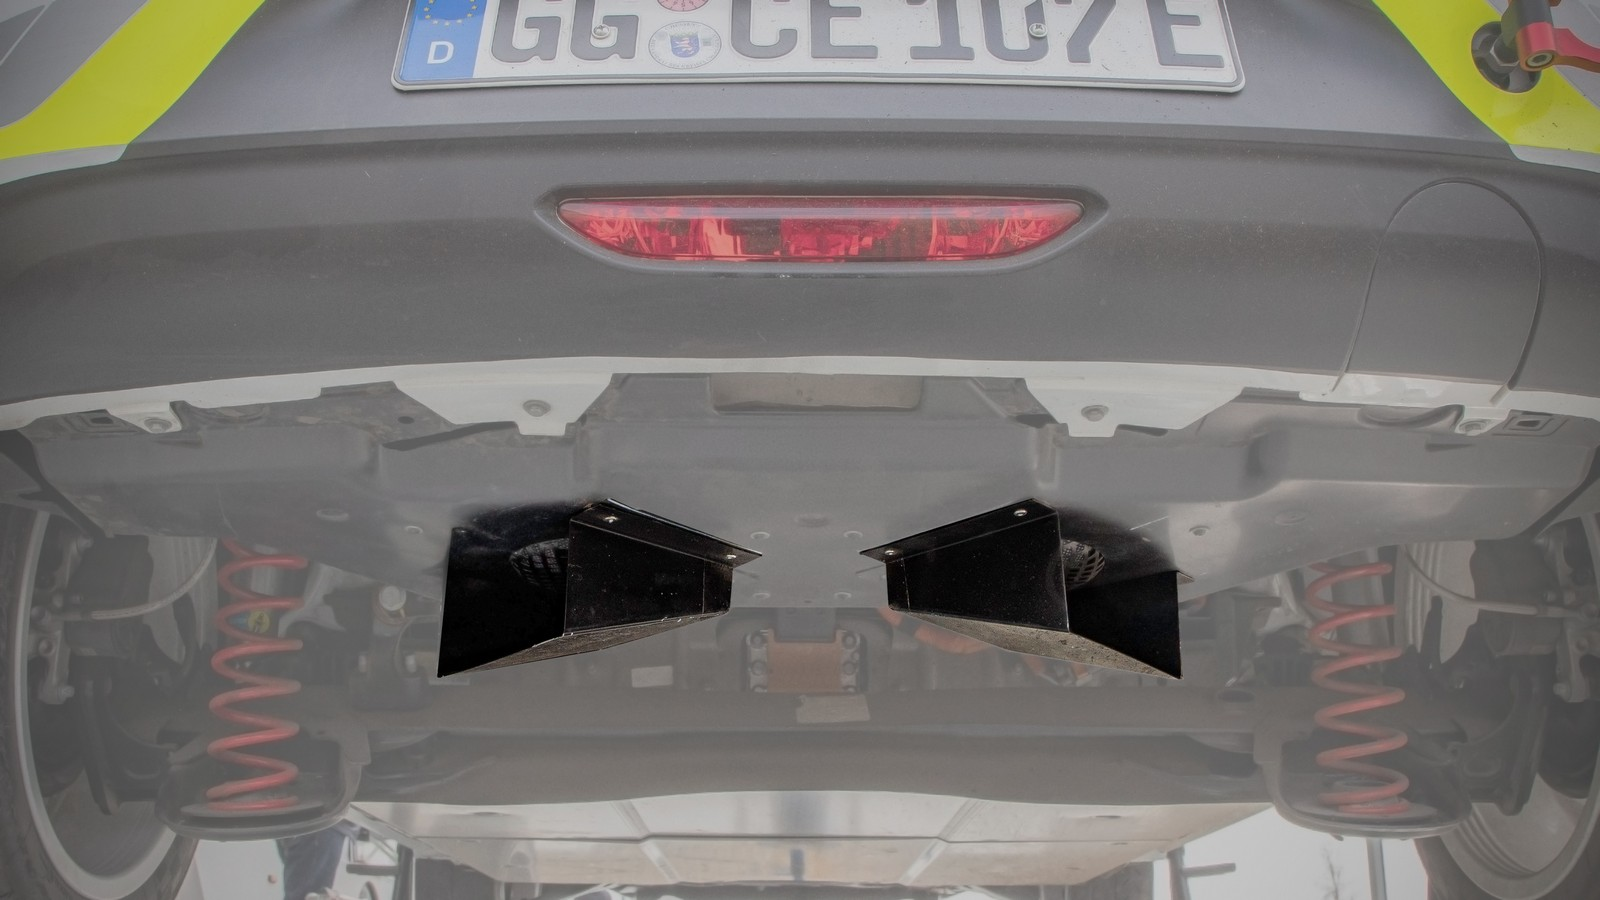 Opel Corsa E Rally, Hintere Lautsprecher